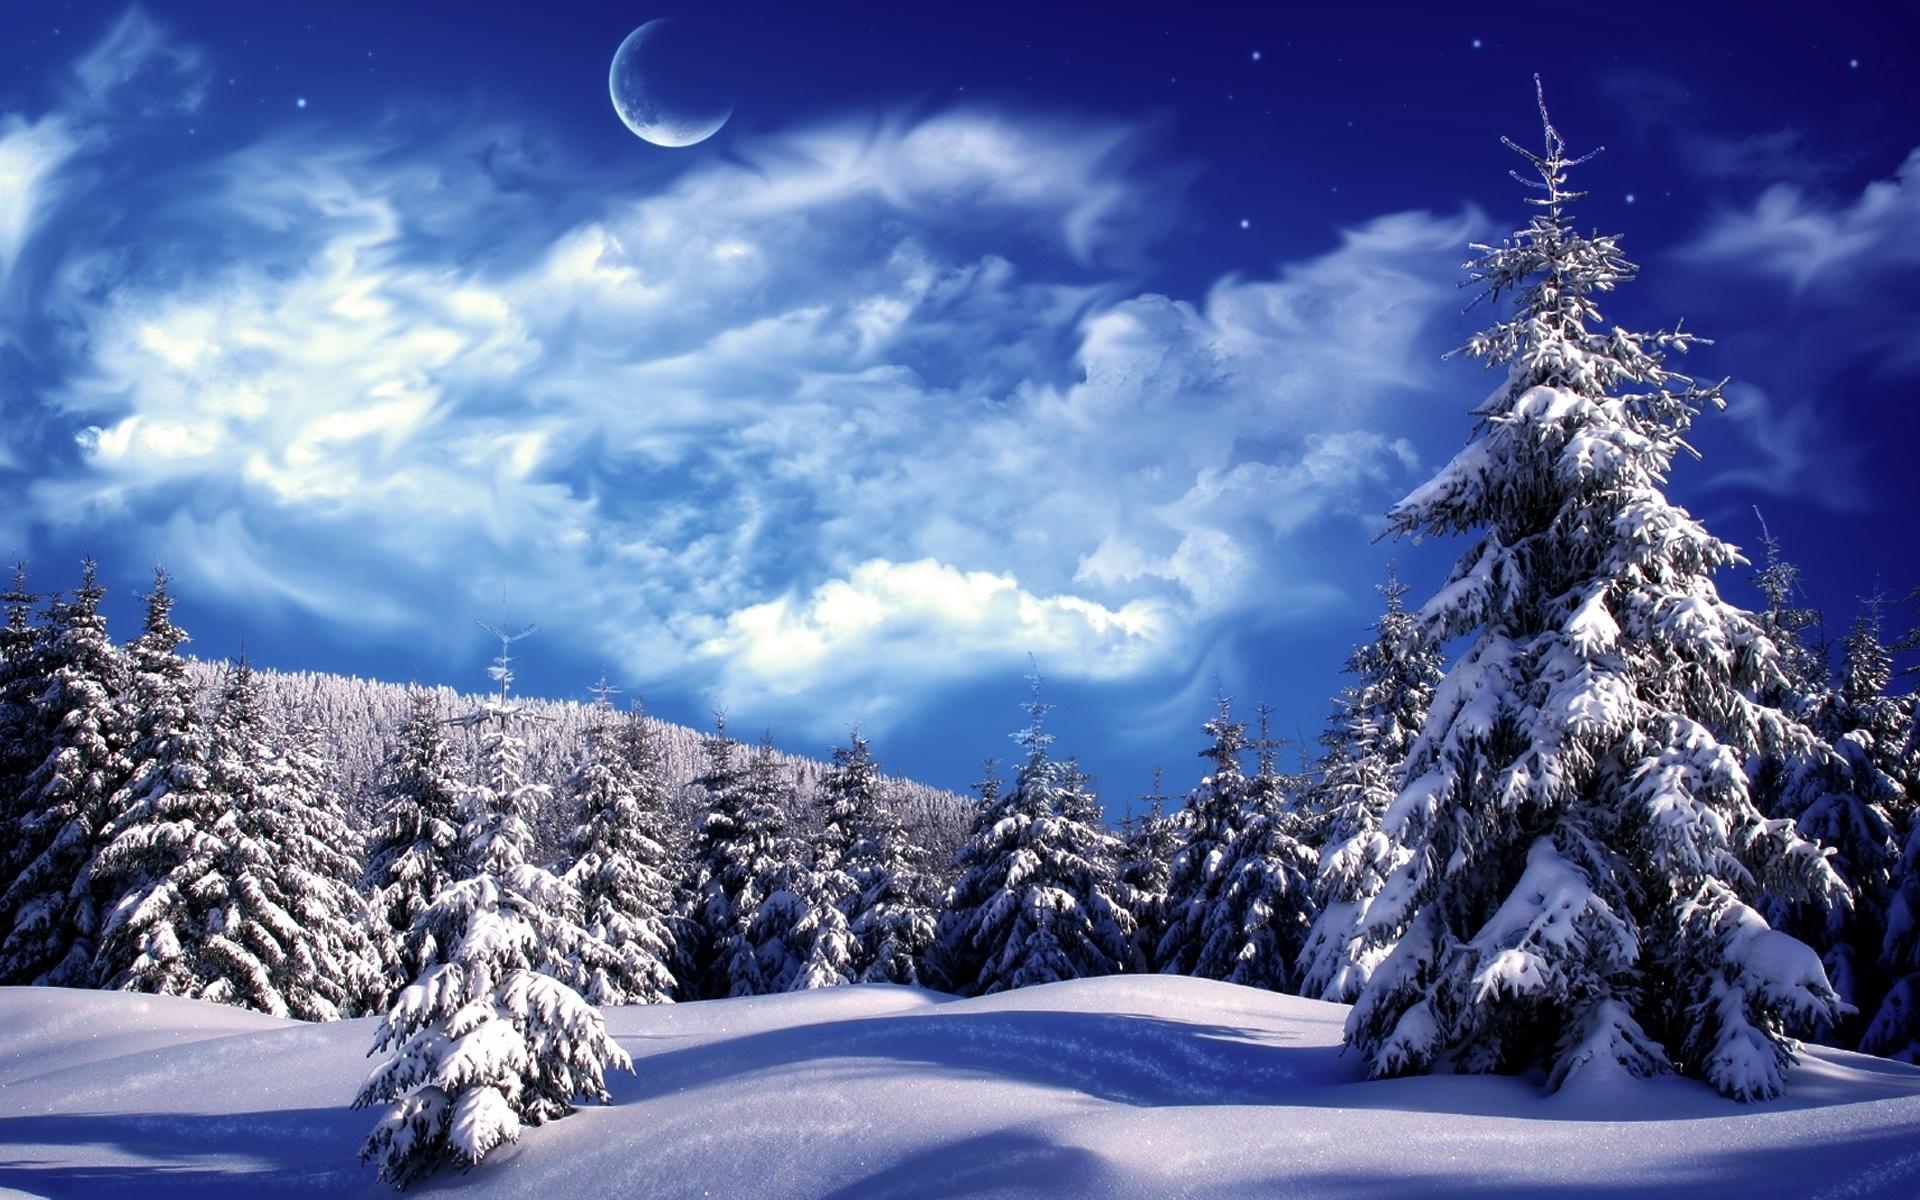 christmas winter scenes free desktop wallpaper winter scenes | hd